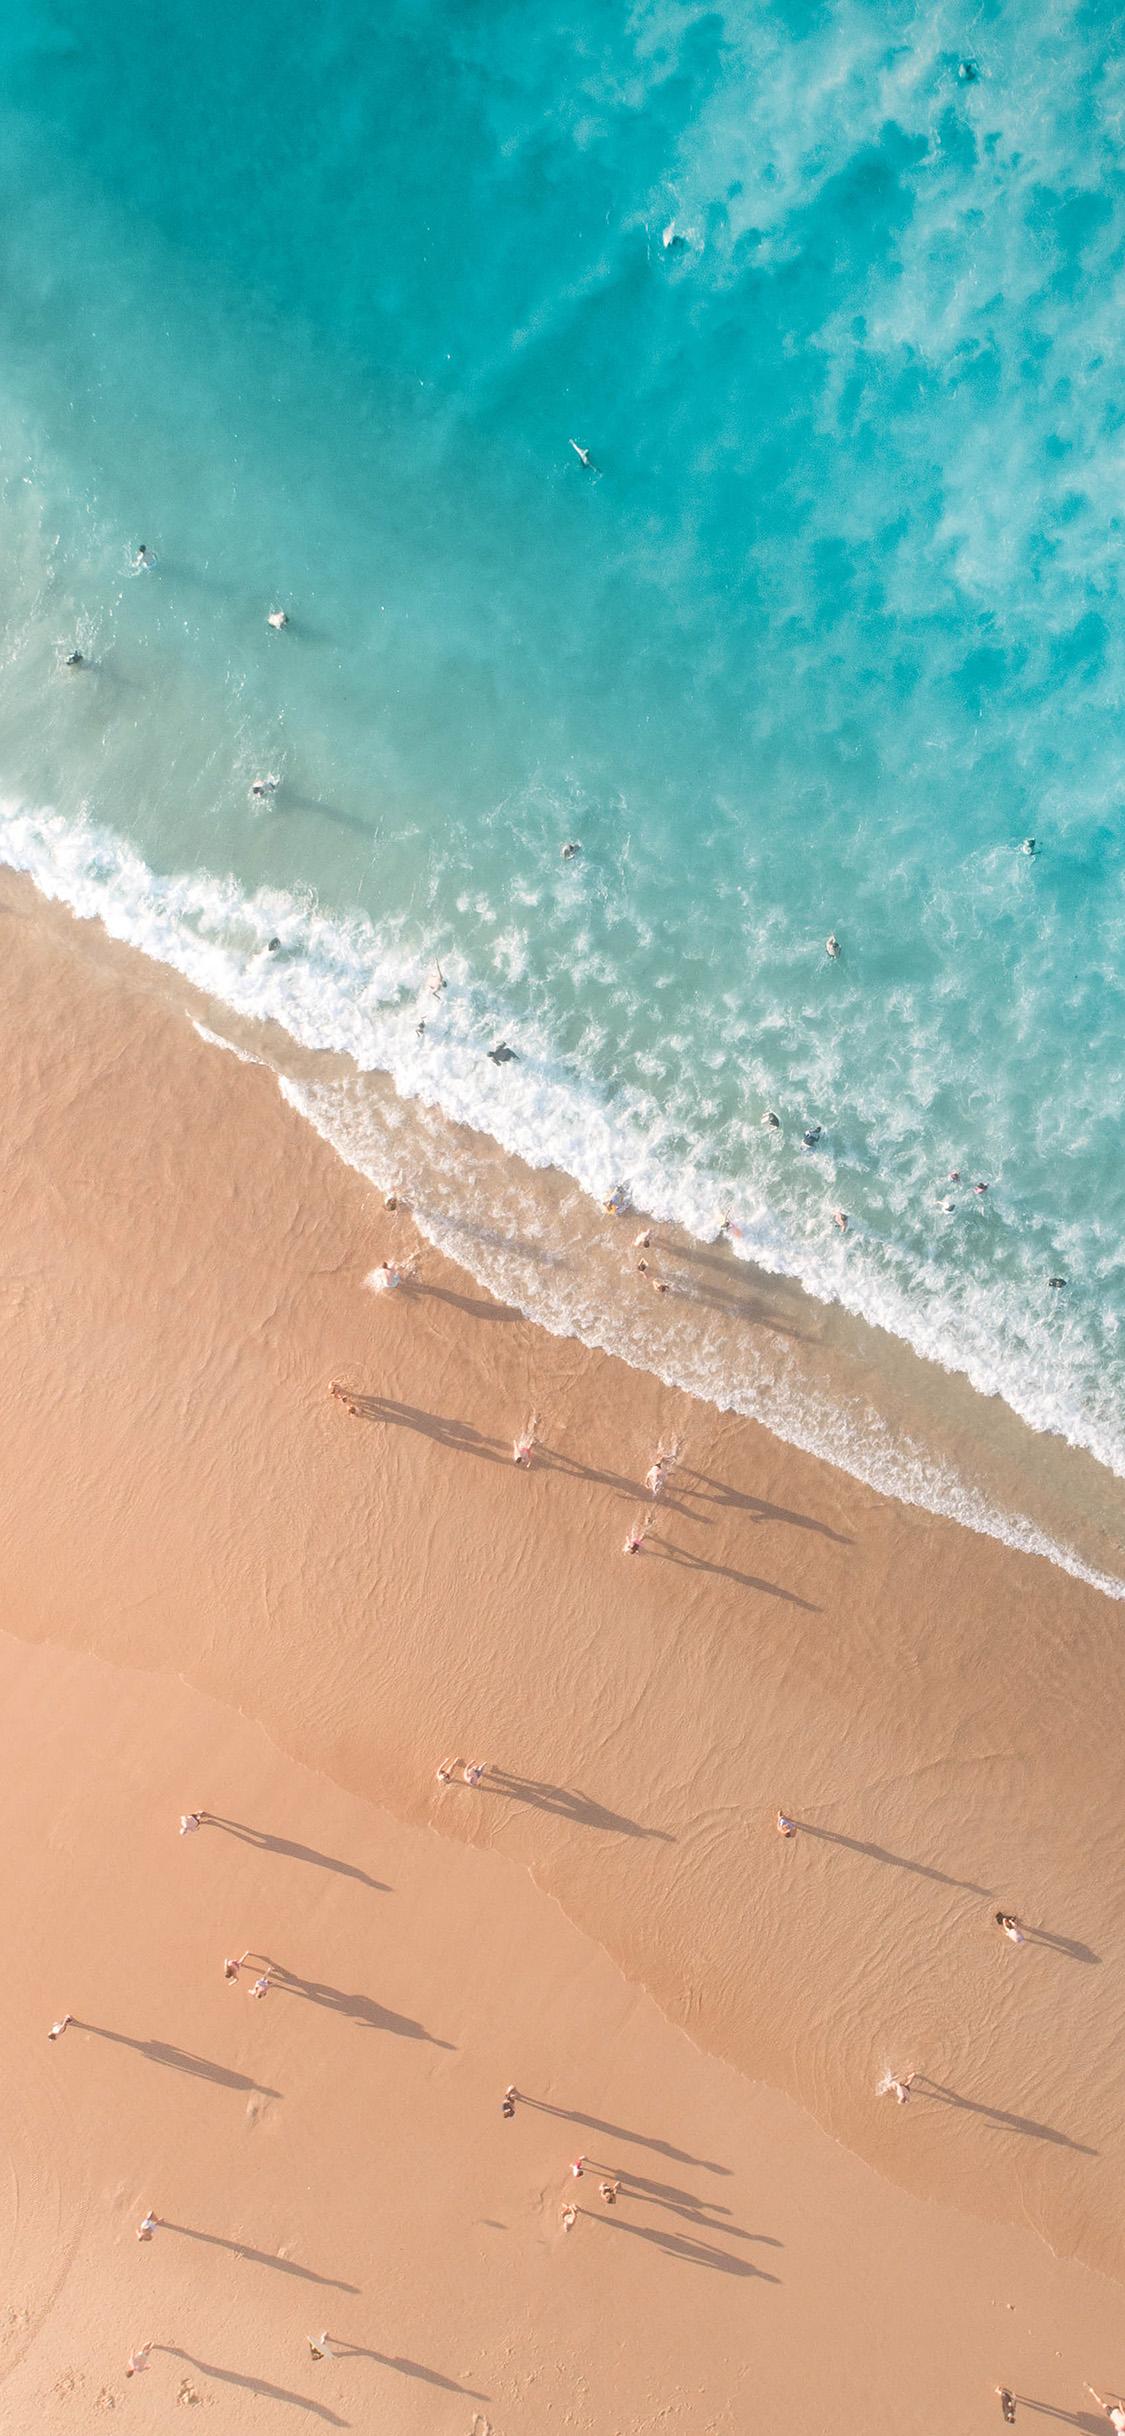 Iphonexpapers Com Iphone X Wallpaper Oc67 Sea Vacation Beach Ocean Summer Nature